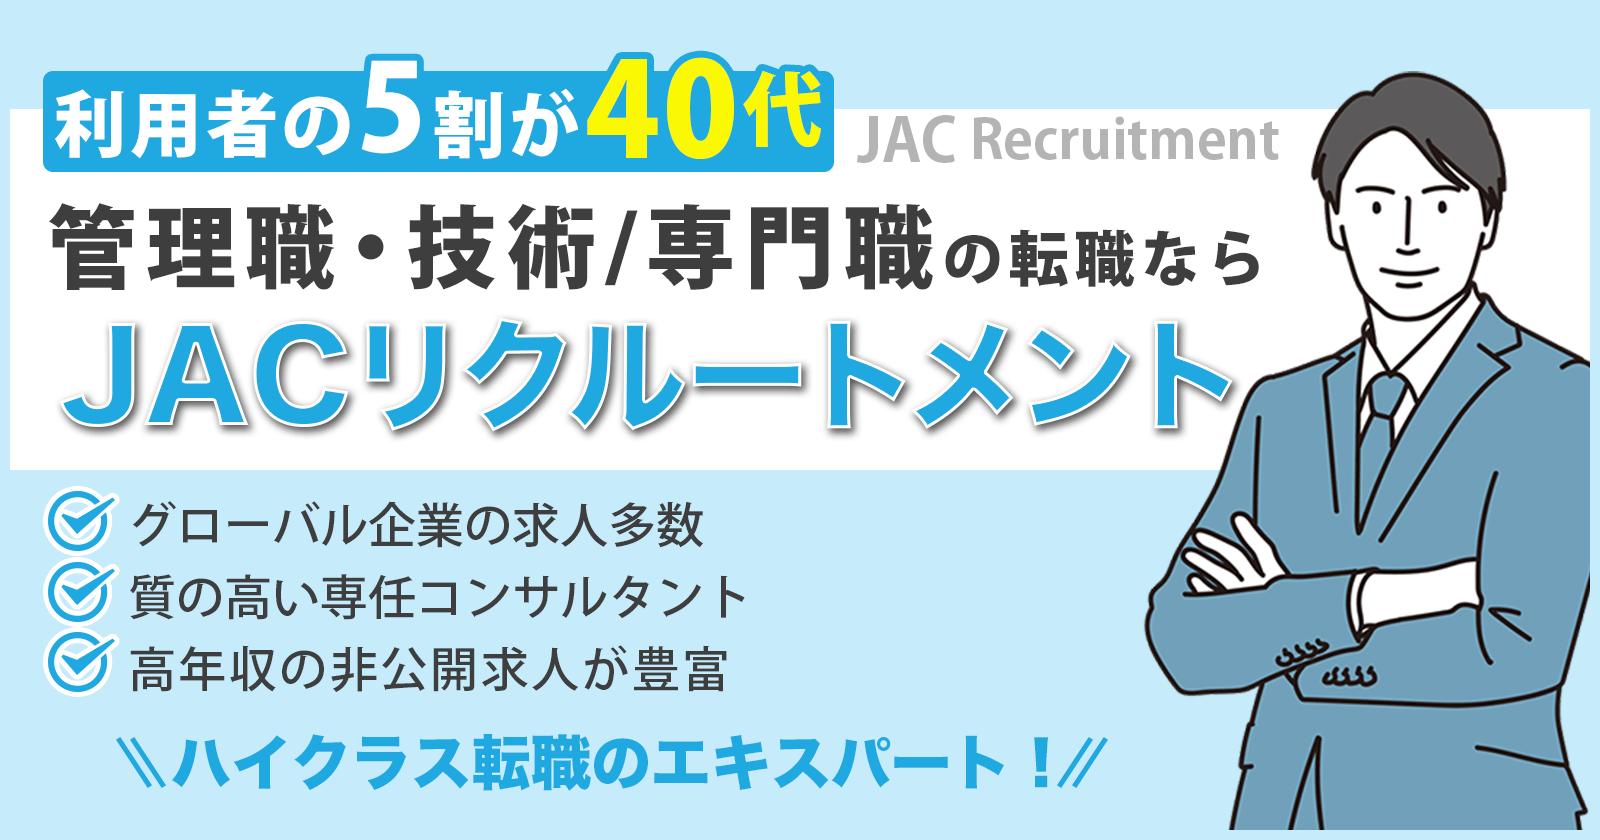 JACリクルートメントは利用者の5割が40代!特徴と評判を解説